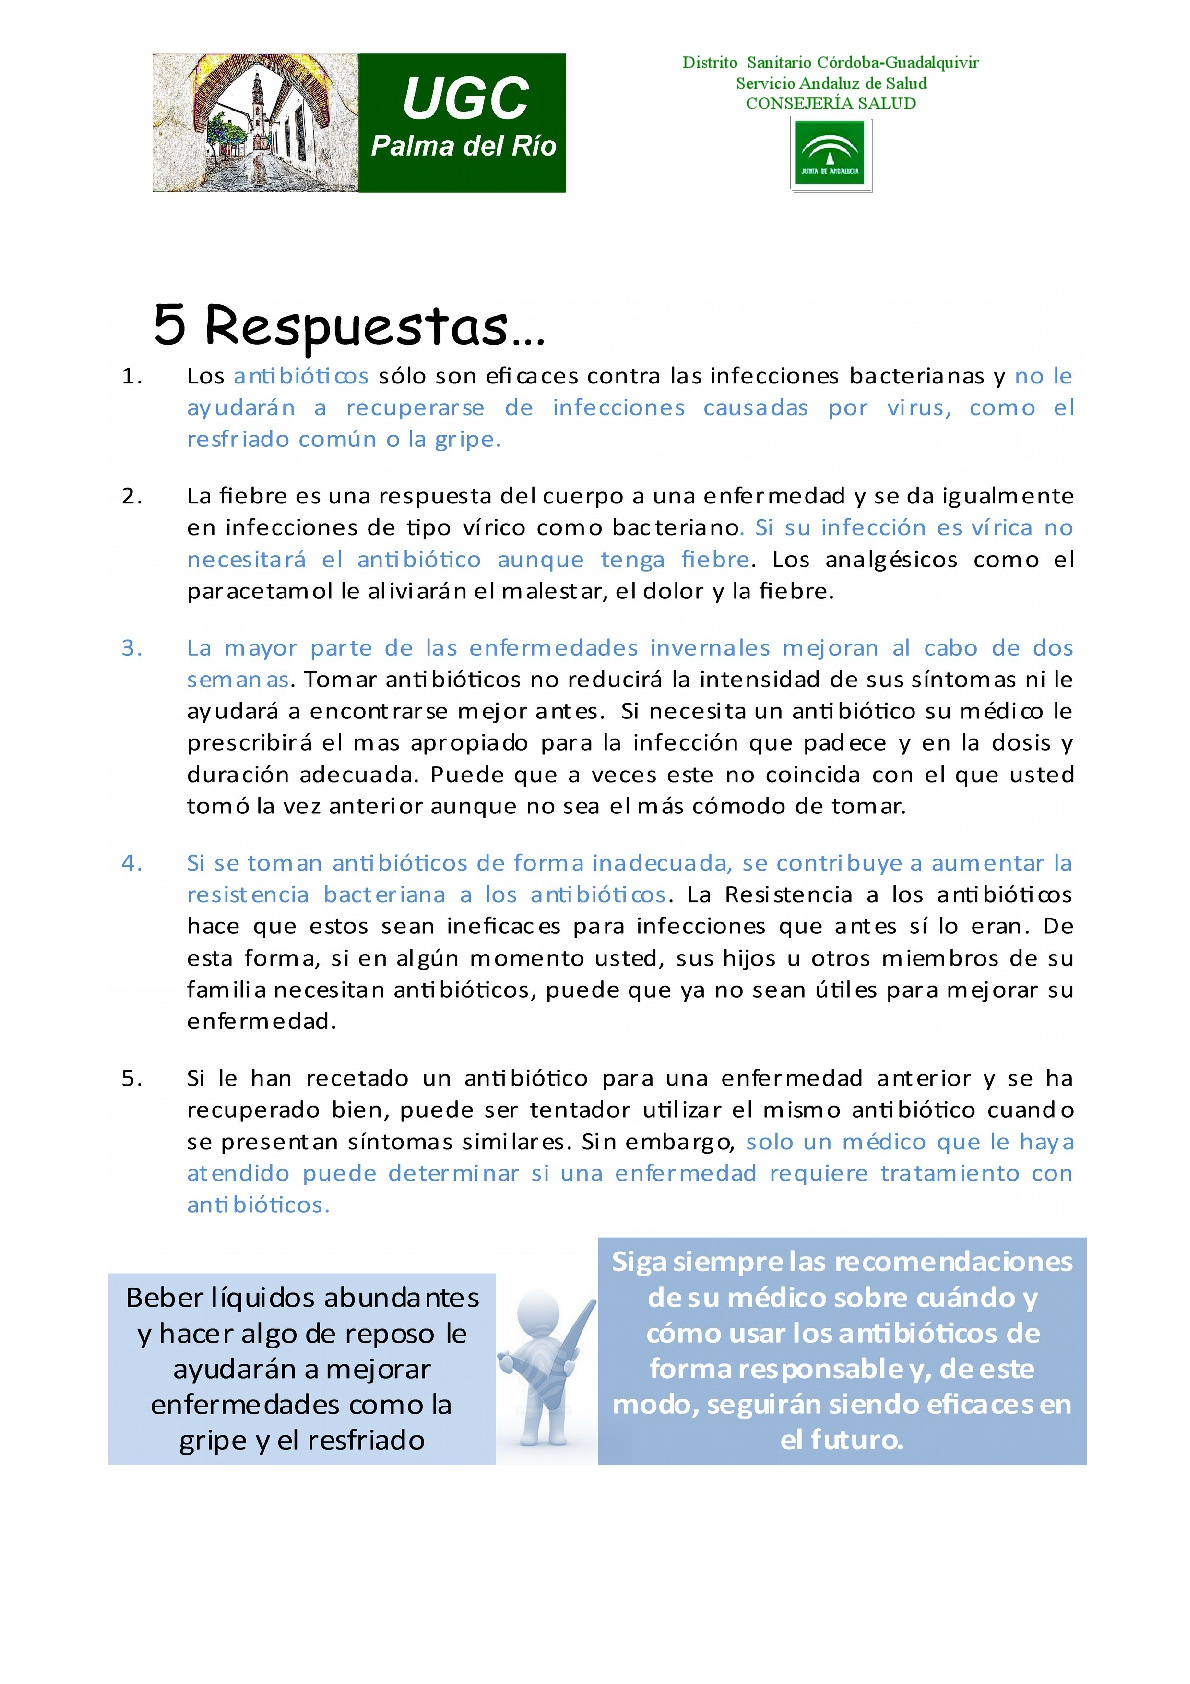 https://www.palmadelrio.es/sites/default/files/uso-antibiotico-002.jpg